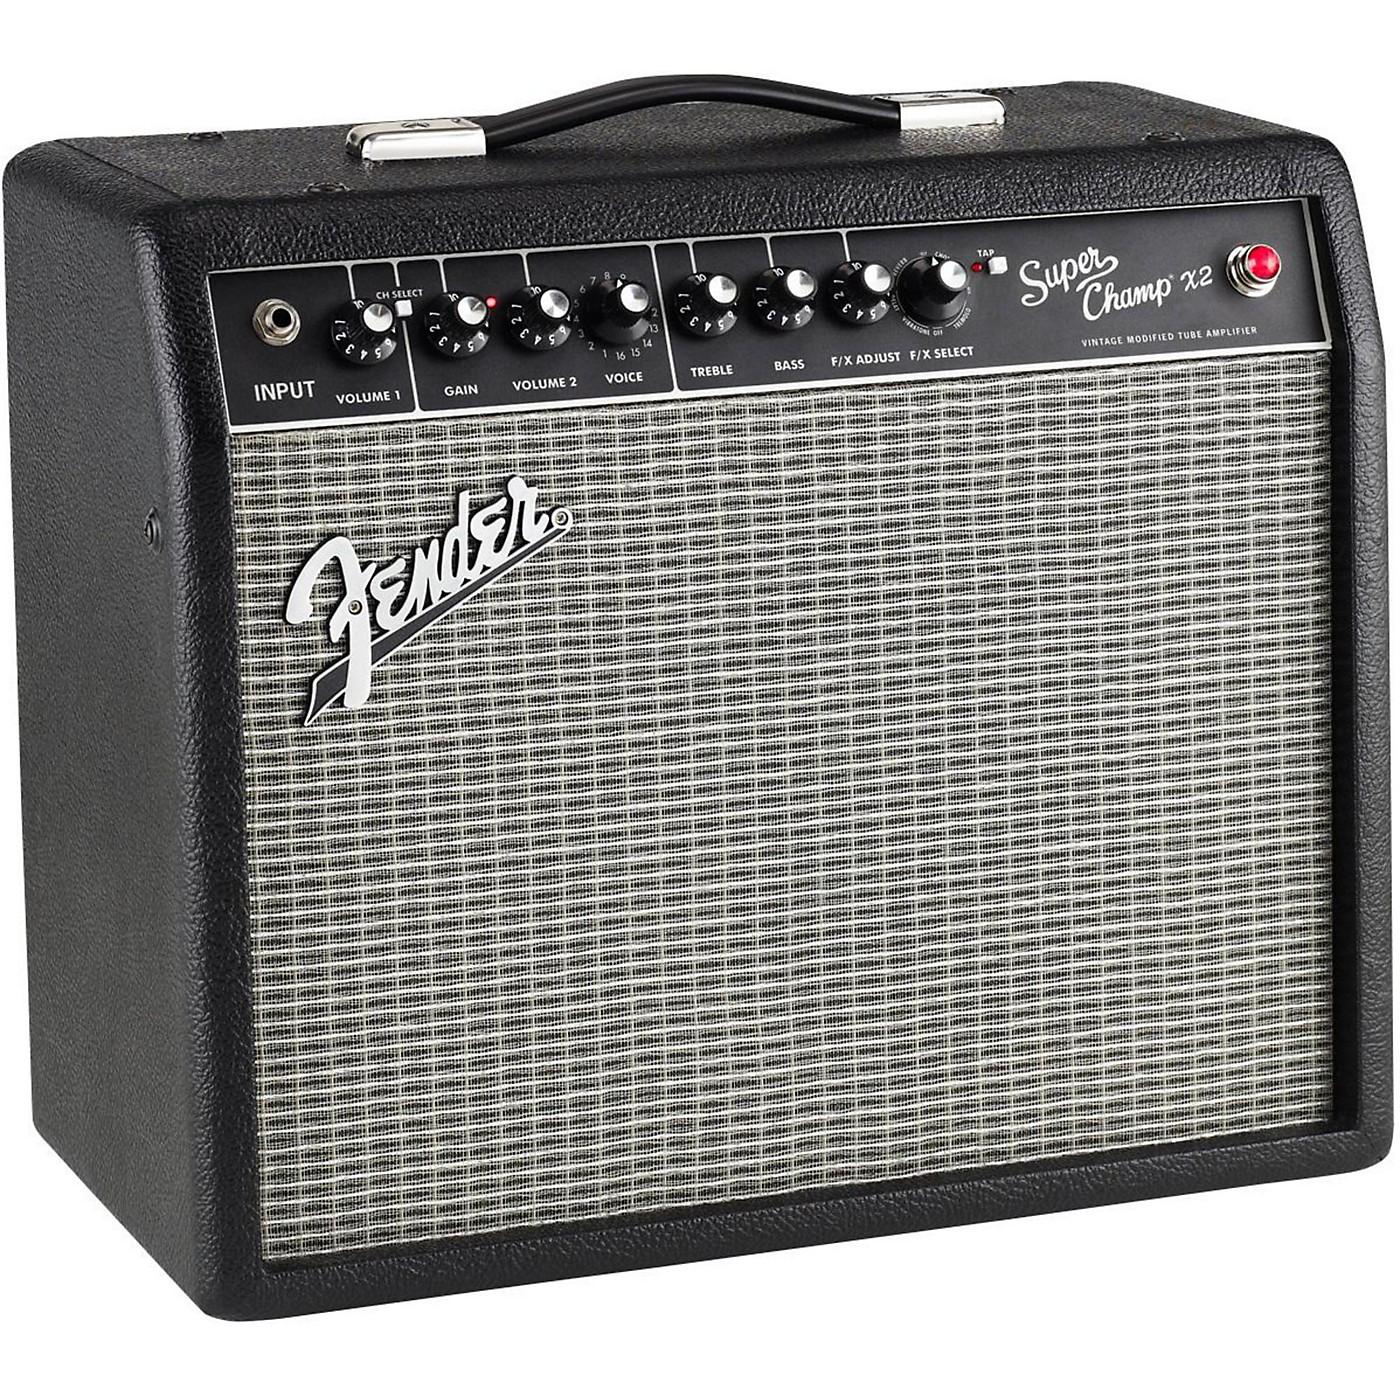 Fender Super-Champ X2 15W 1x10 Tube Guitar Combo Amp thumbnail